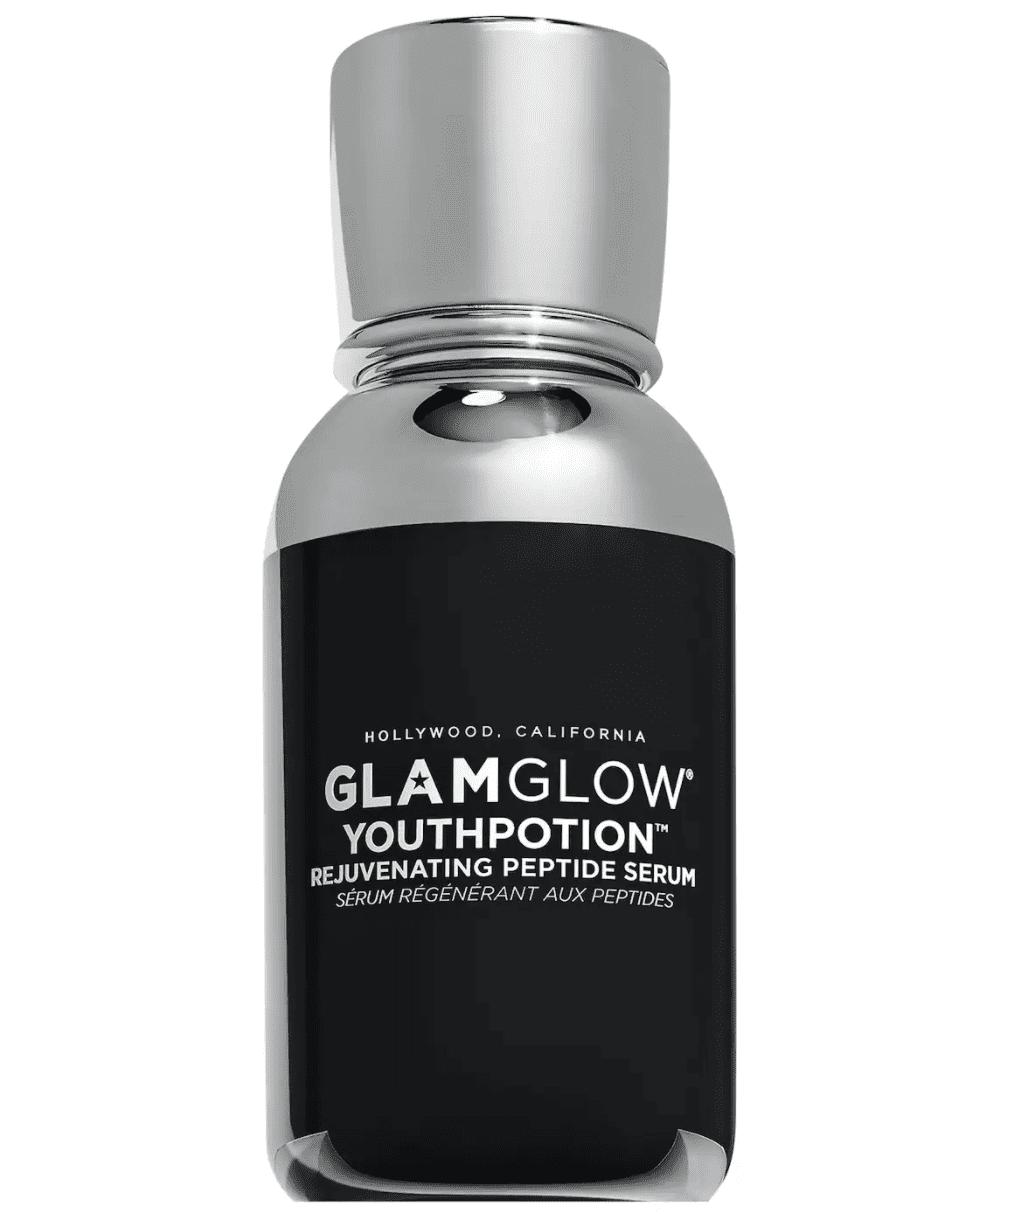 GLAMGLOW YOUHTPOTION